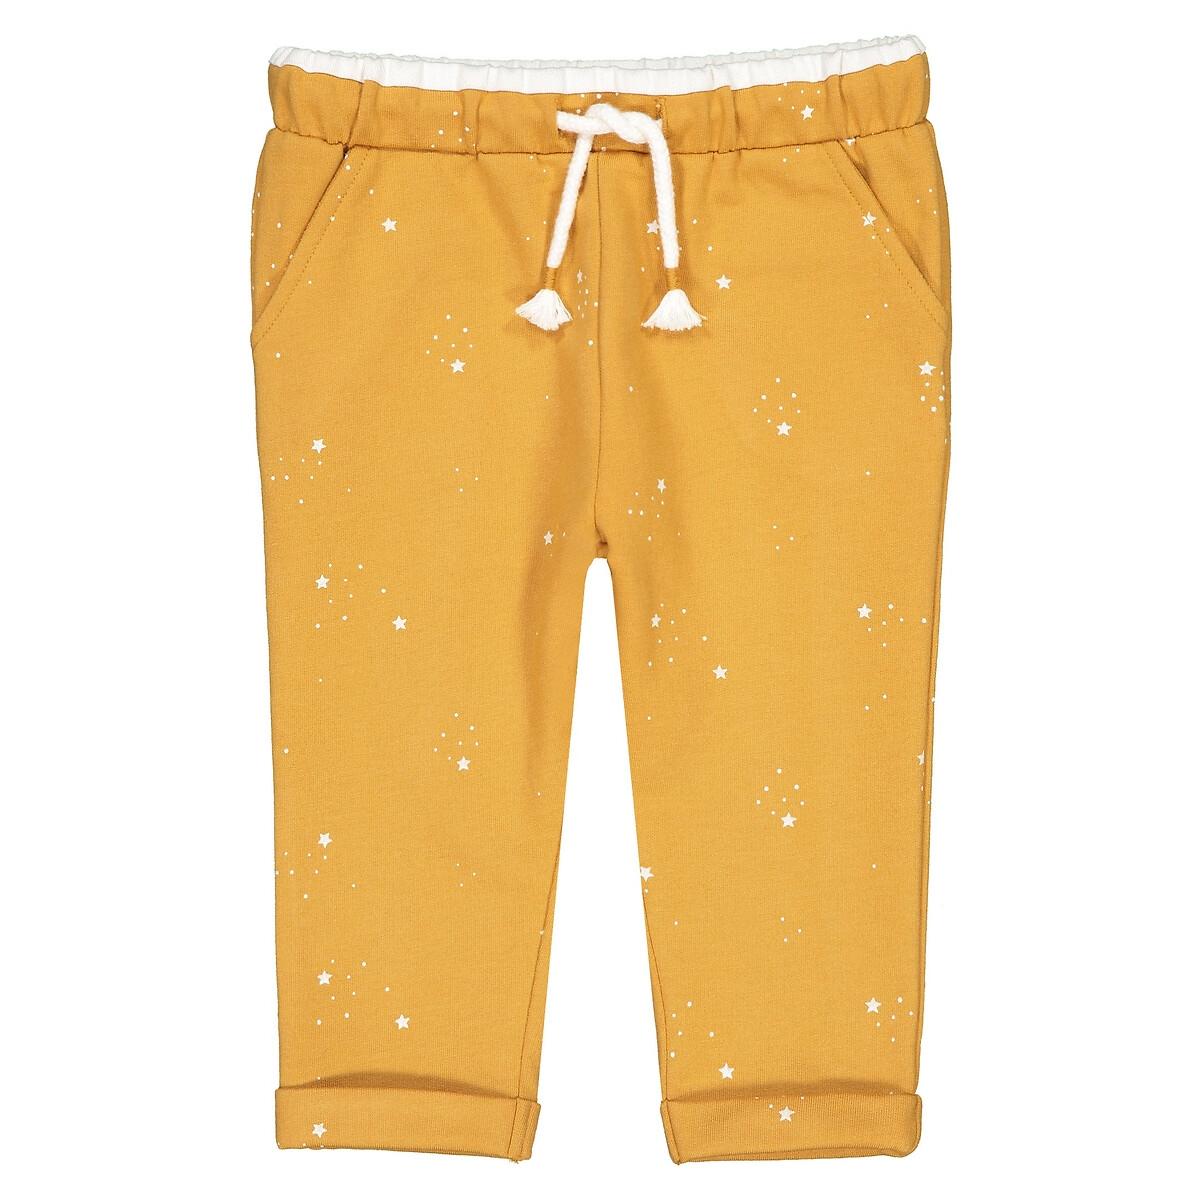 Фото - Брюки LaRedoute Из мольтона с рисунком звезды 1 мес - 3 года 3 мес. - 60 см желтый брюки laredoute из мольтона с бантом 1 мес 3 года 9 мес 71 см розовый